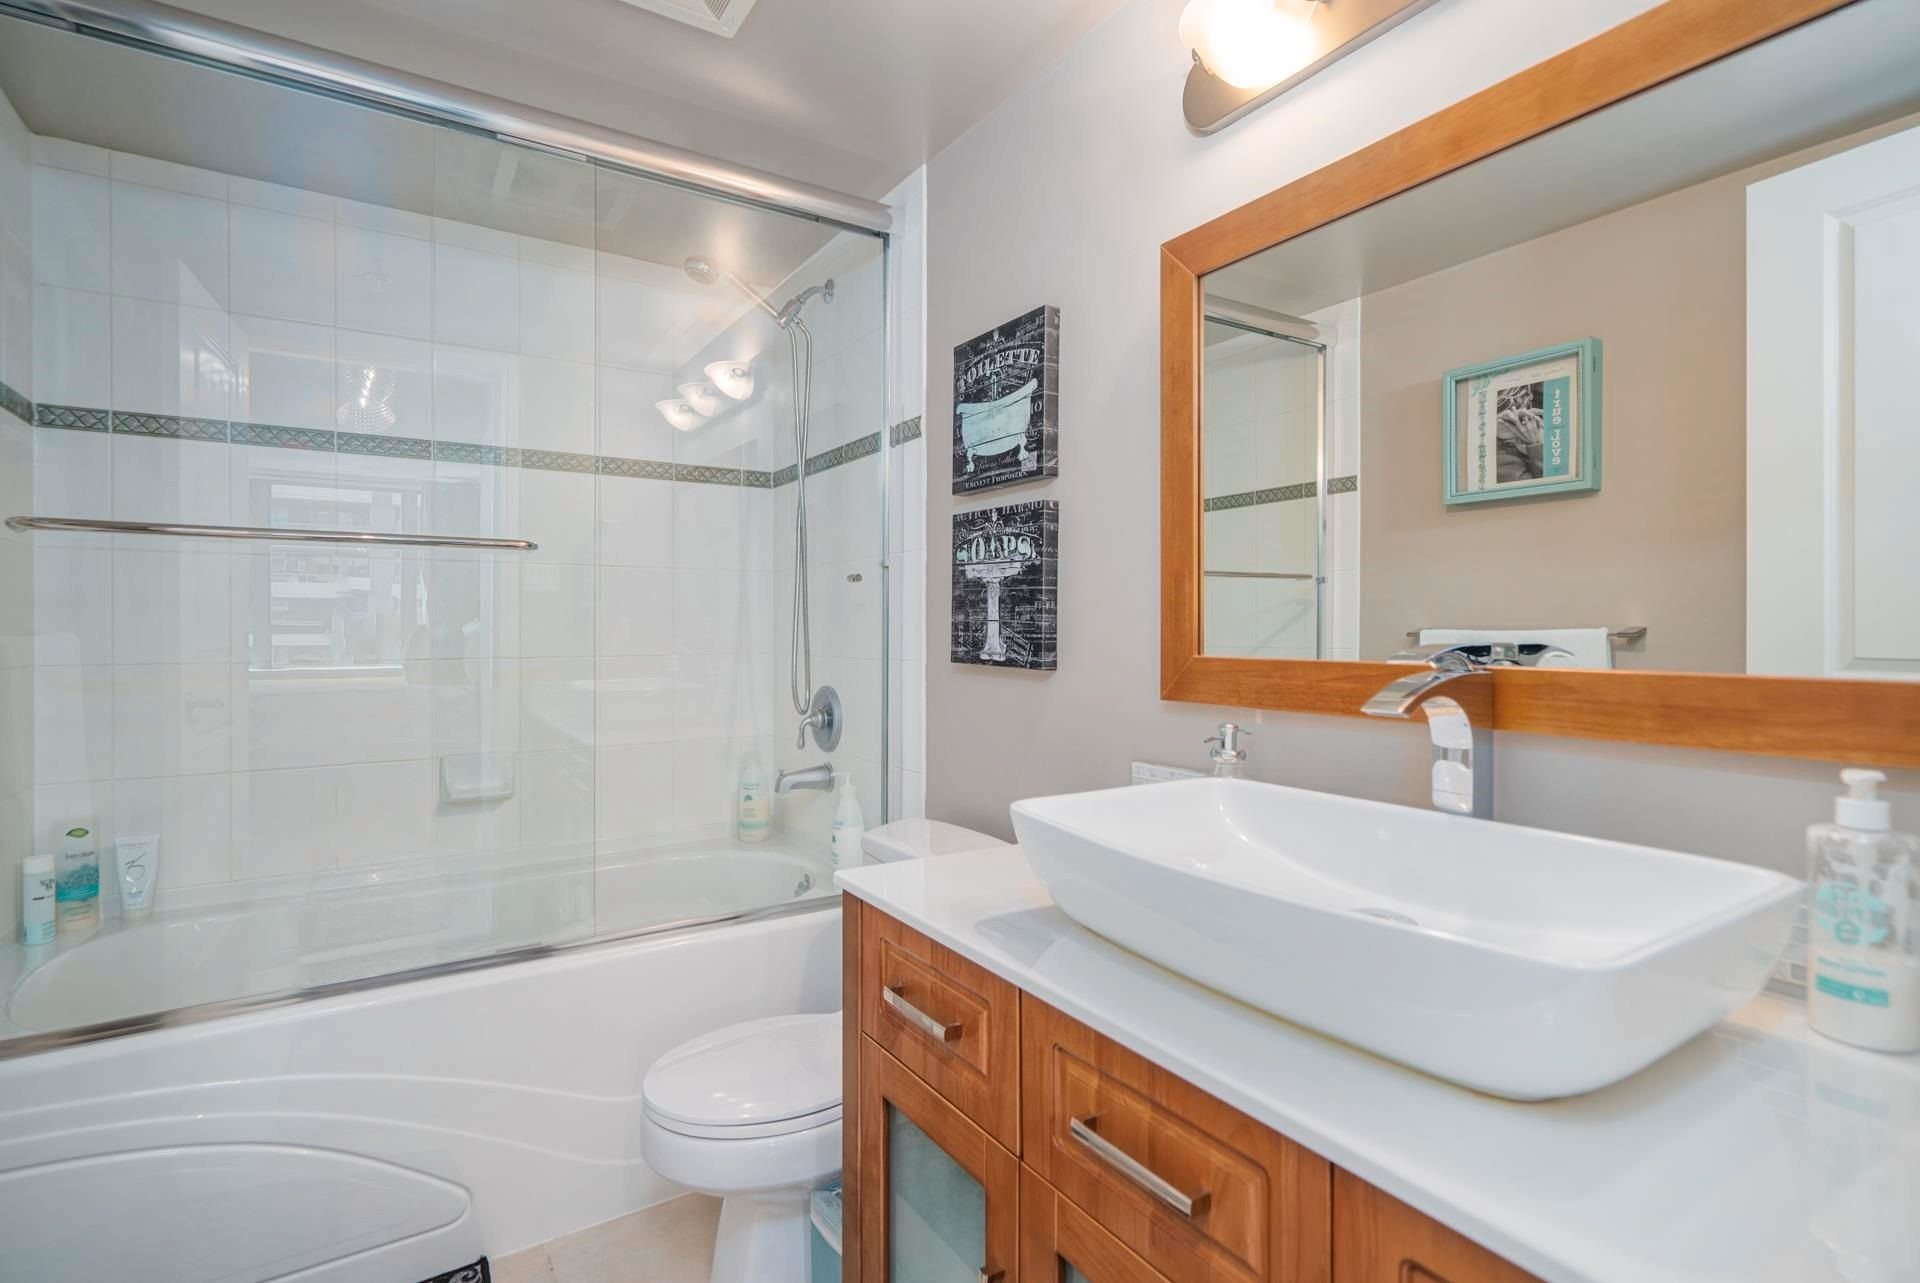 "Photo 19: Photos: 704 4388 BUCHANAN Street in Burnaby: Brentwood Park Condo for sale in ""Buchanan West"" (Burnaby North)  : MLS®# R2607208"